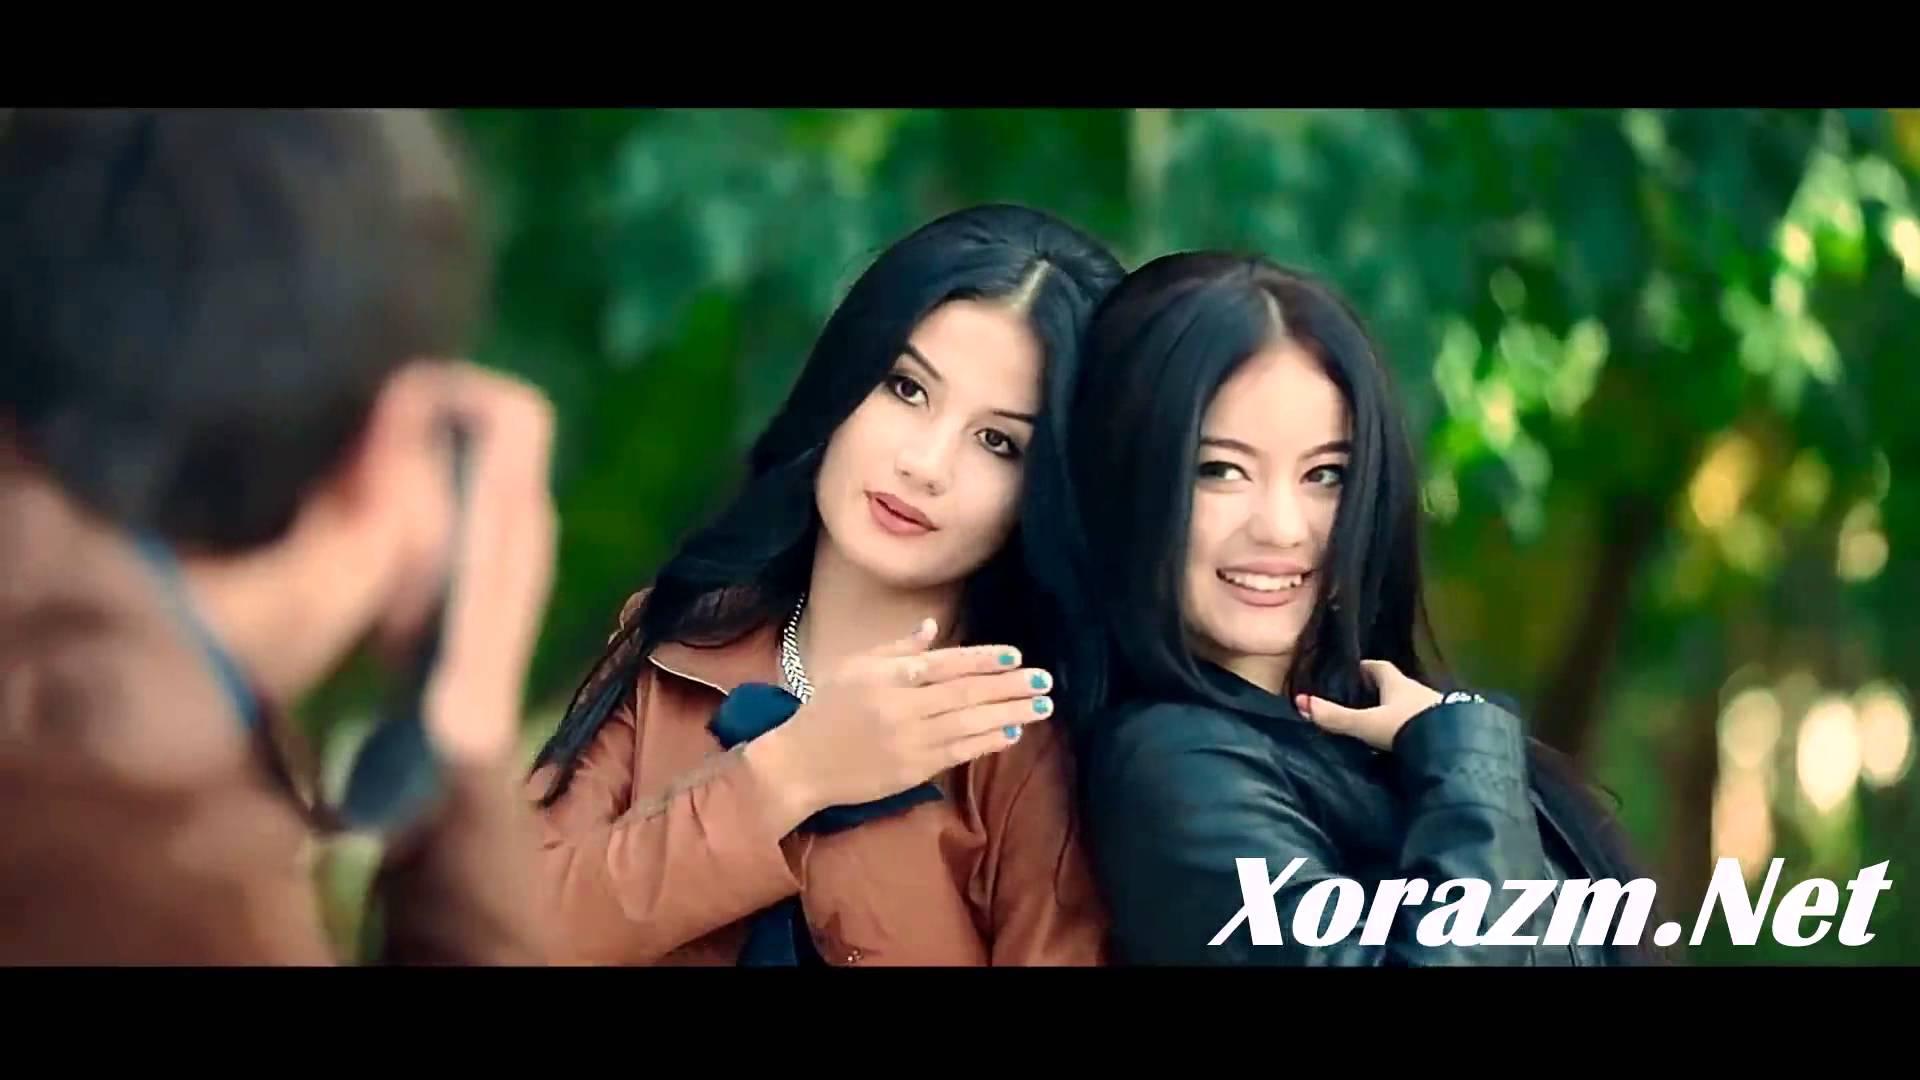 Ютуб музыка узбекская классика, Узбекская классическая музыка video 9 фотография